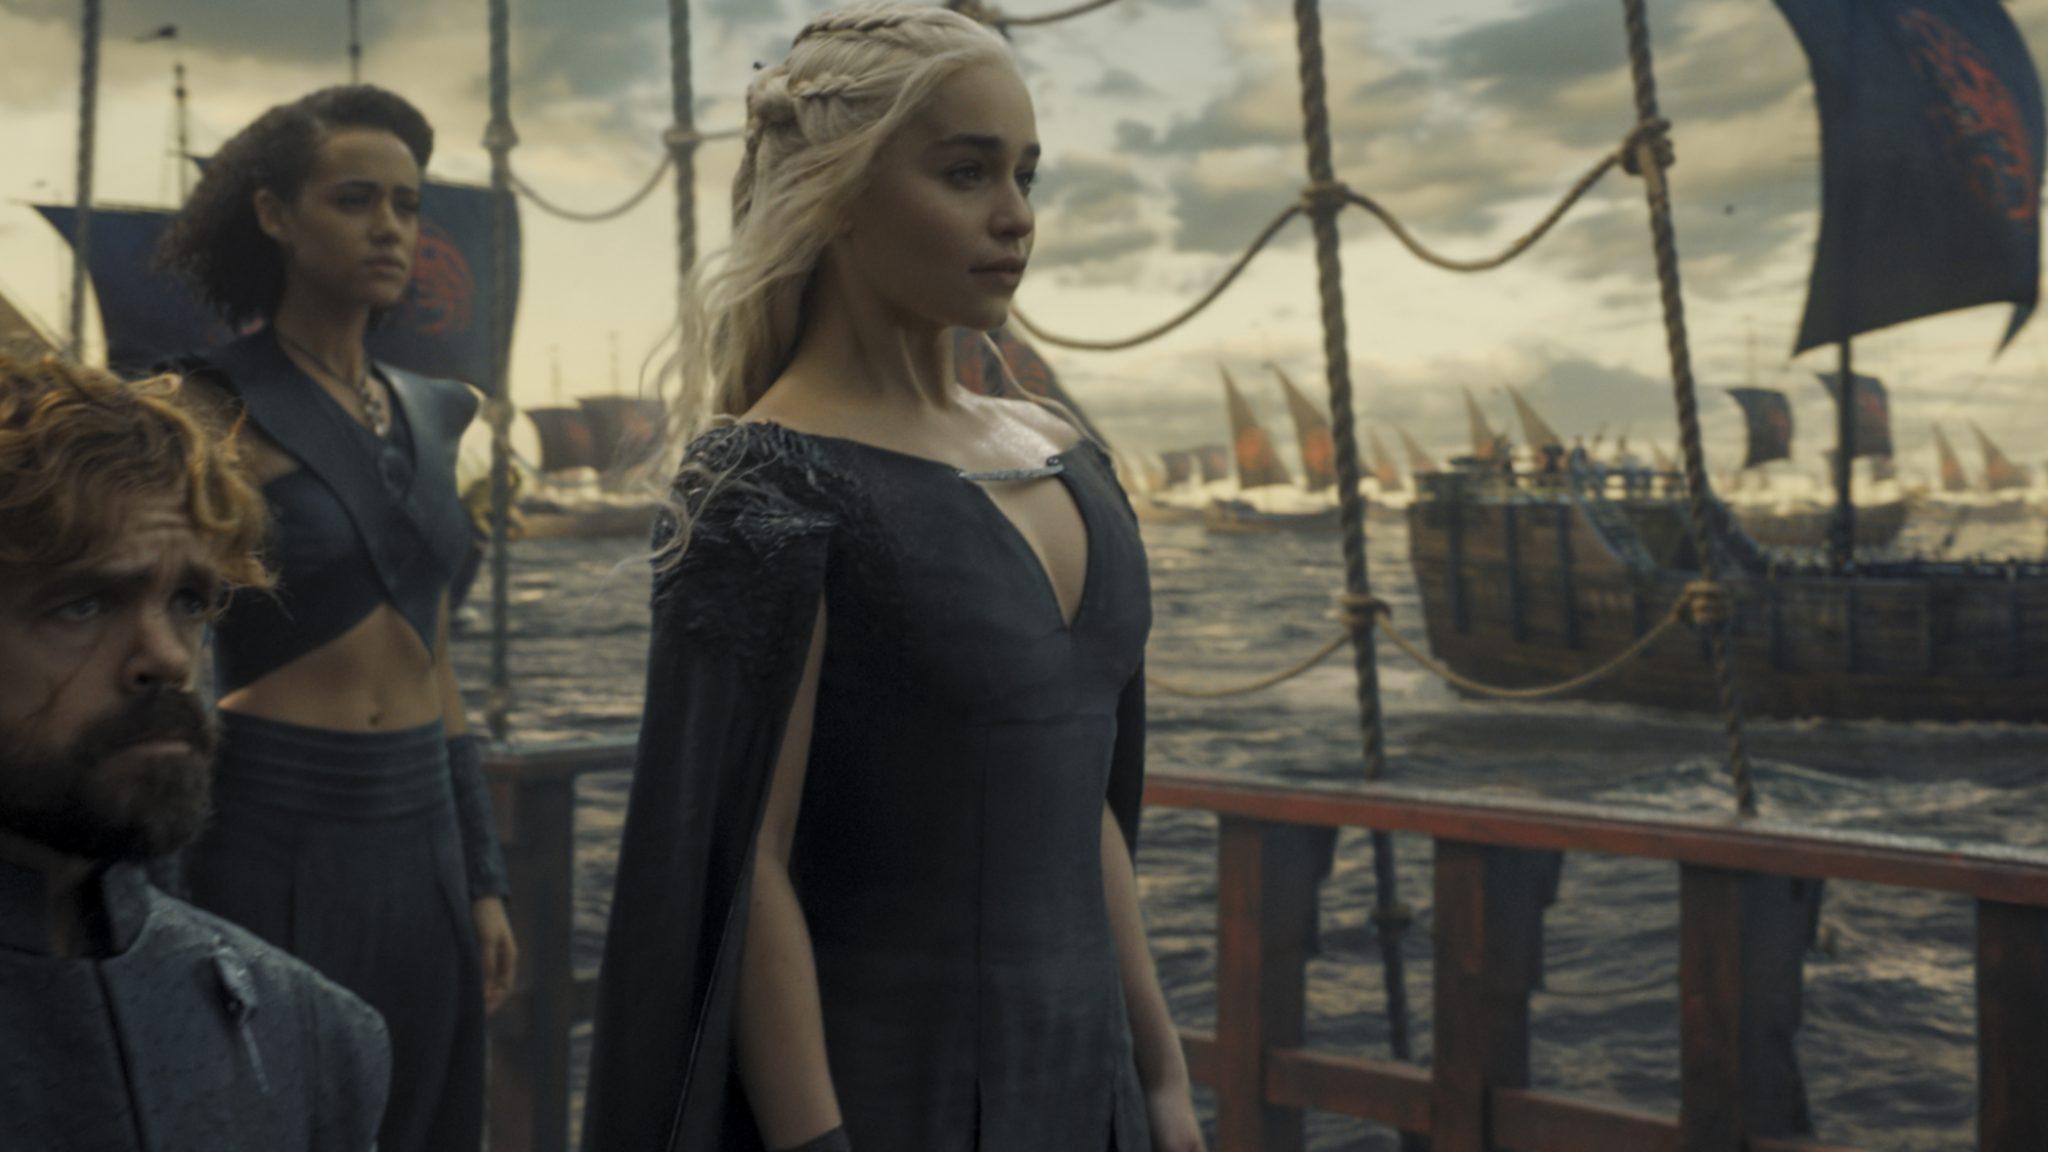 Game of Thrones: Who in Westeros Will Fight Alongside Daenerys Targaryen?